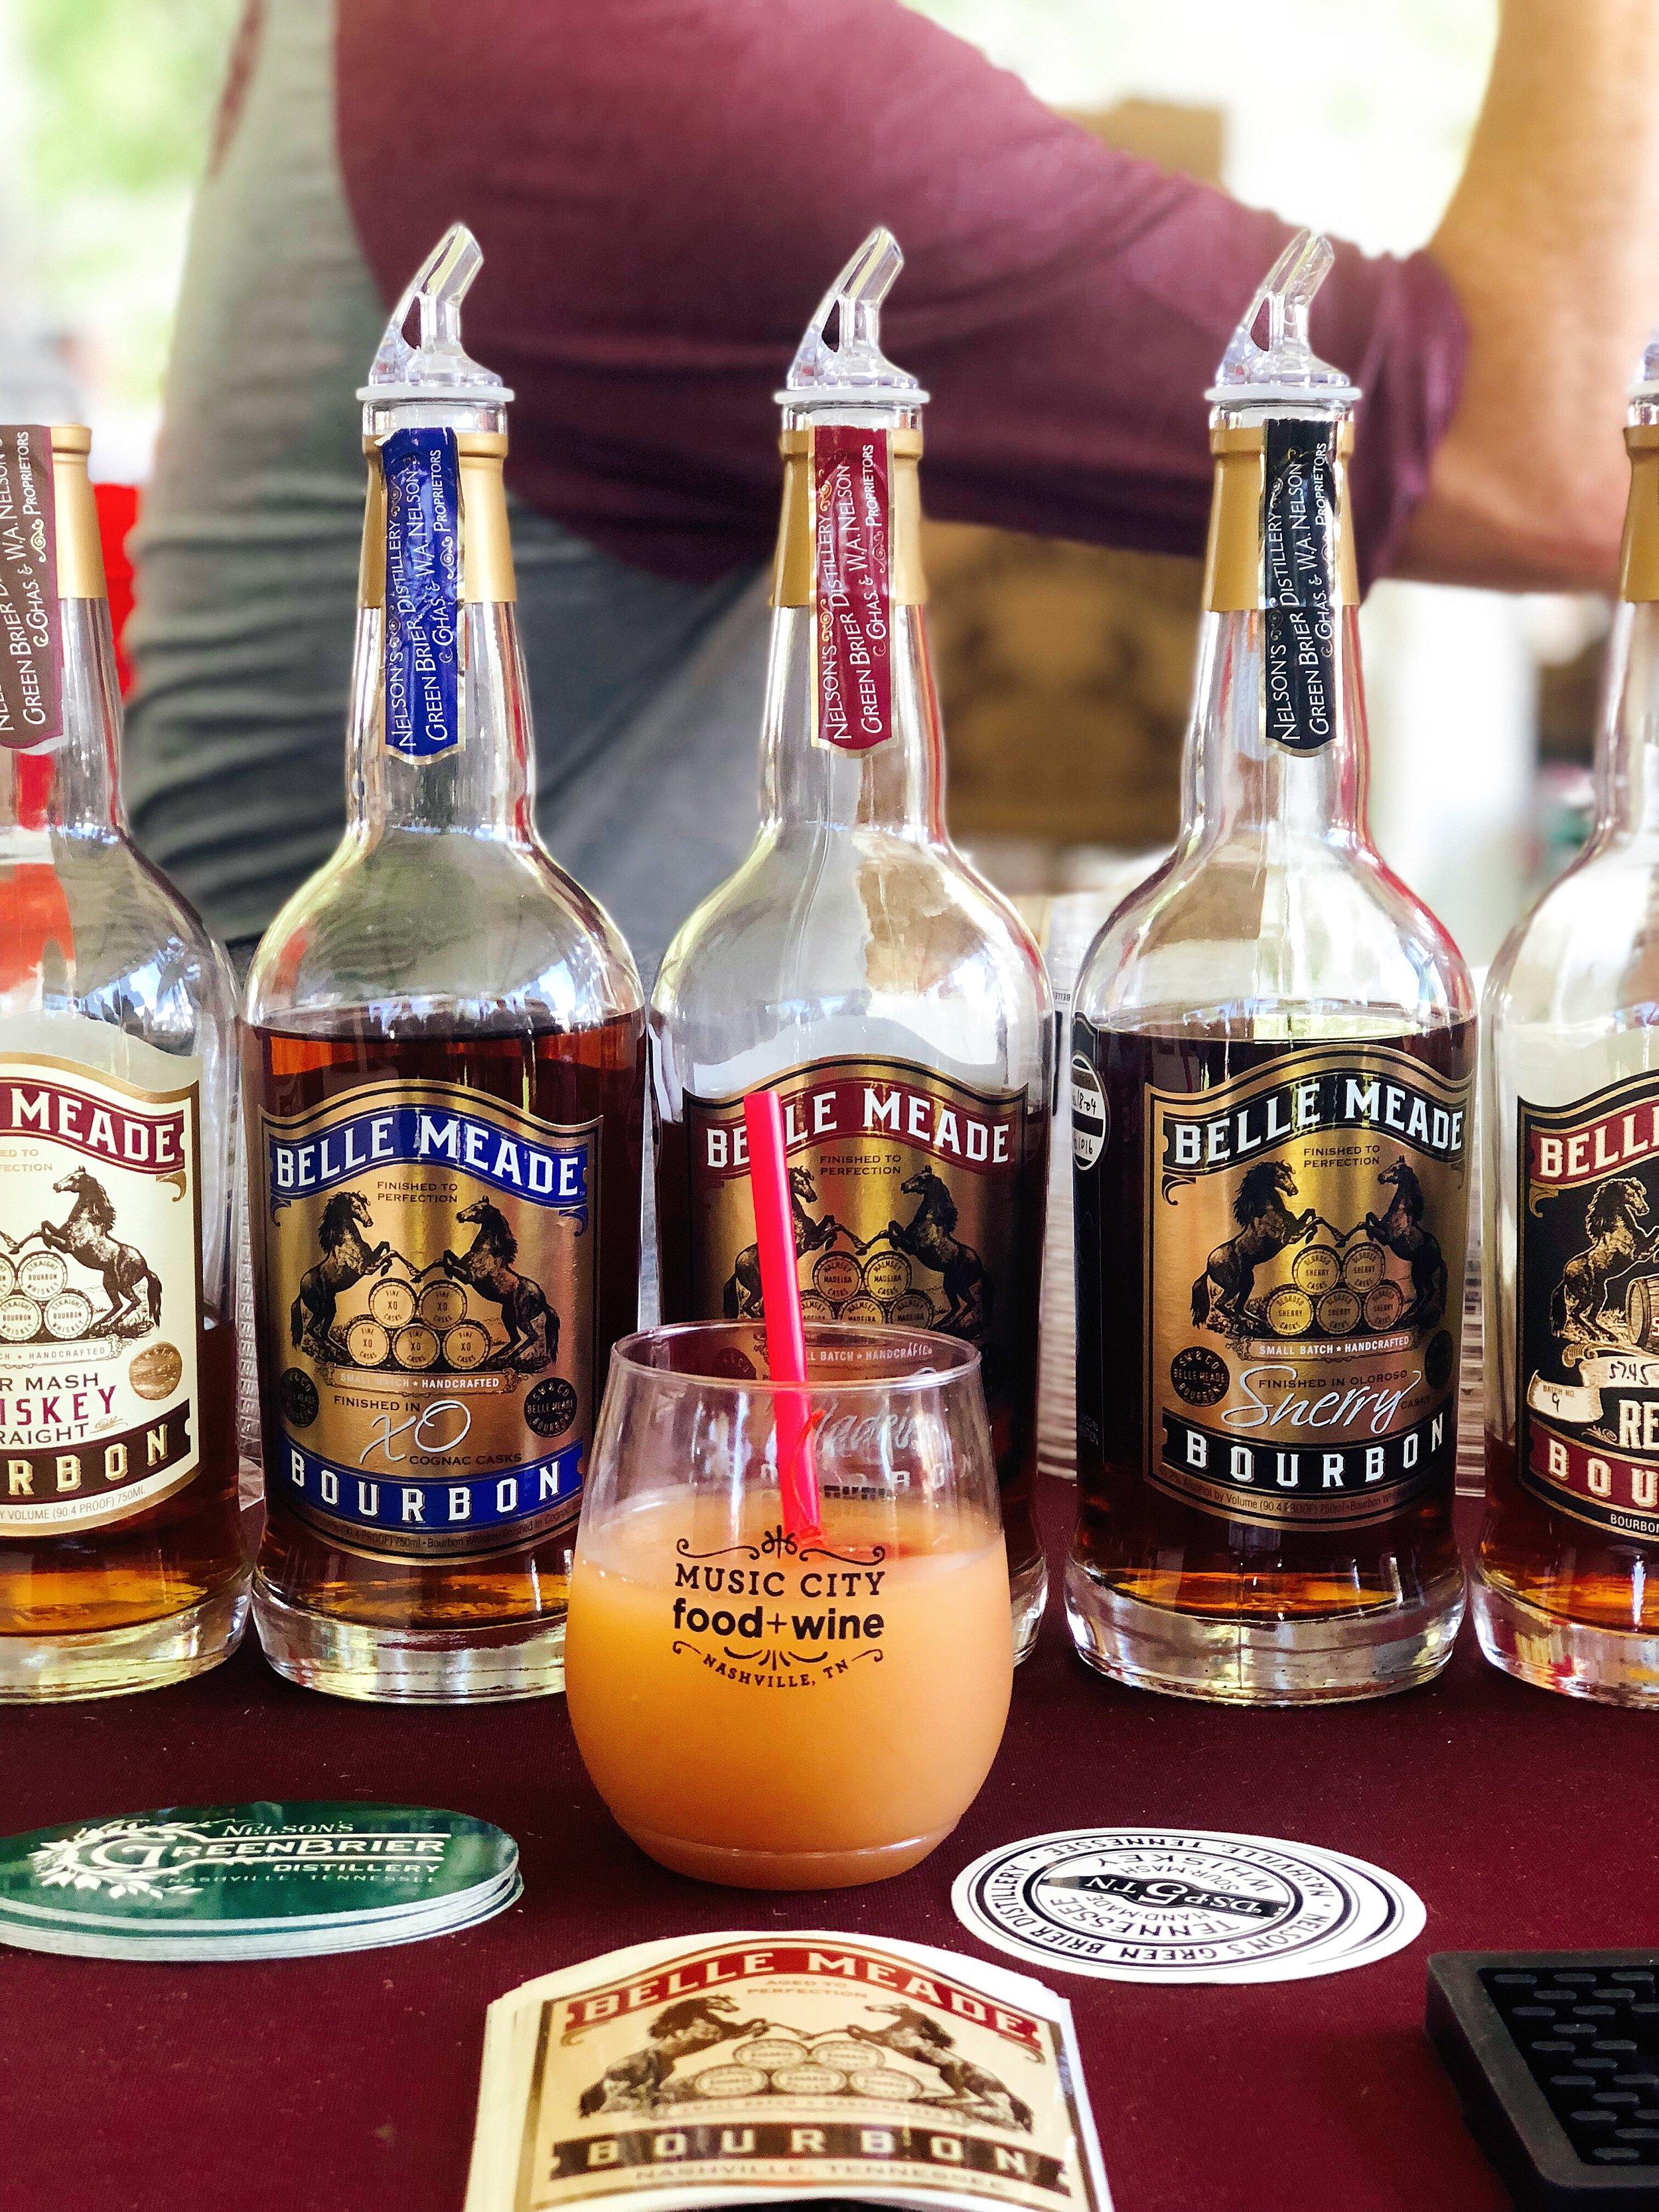 Belle Meade Bourbon- Cold Fashioned